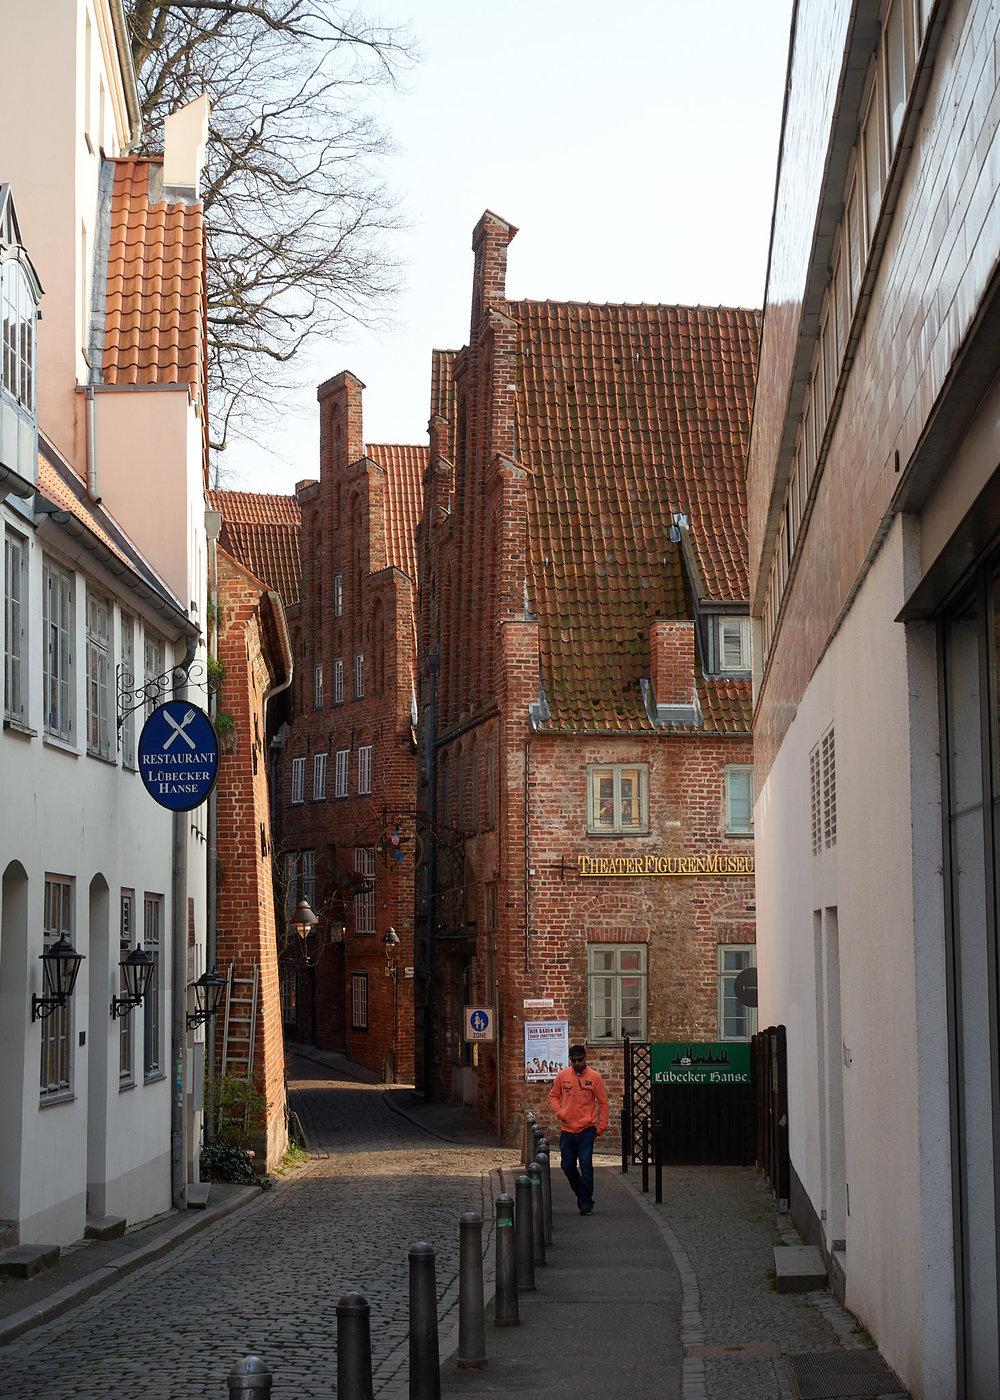 20190330-Lübeck-306.jpg